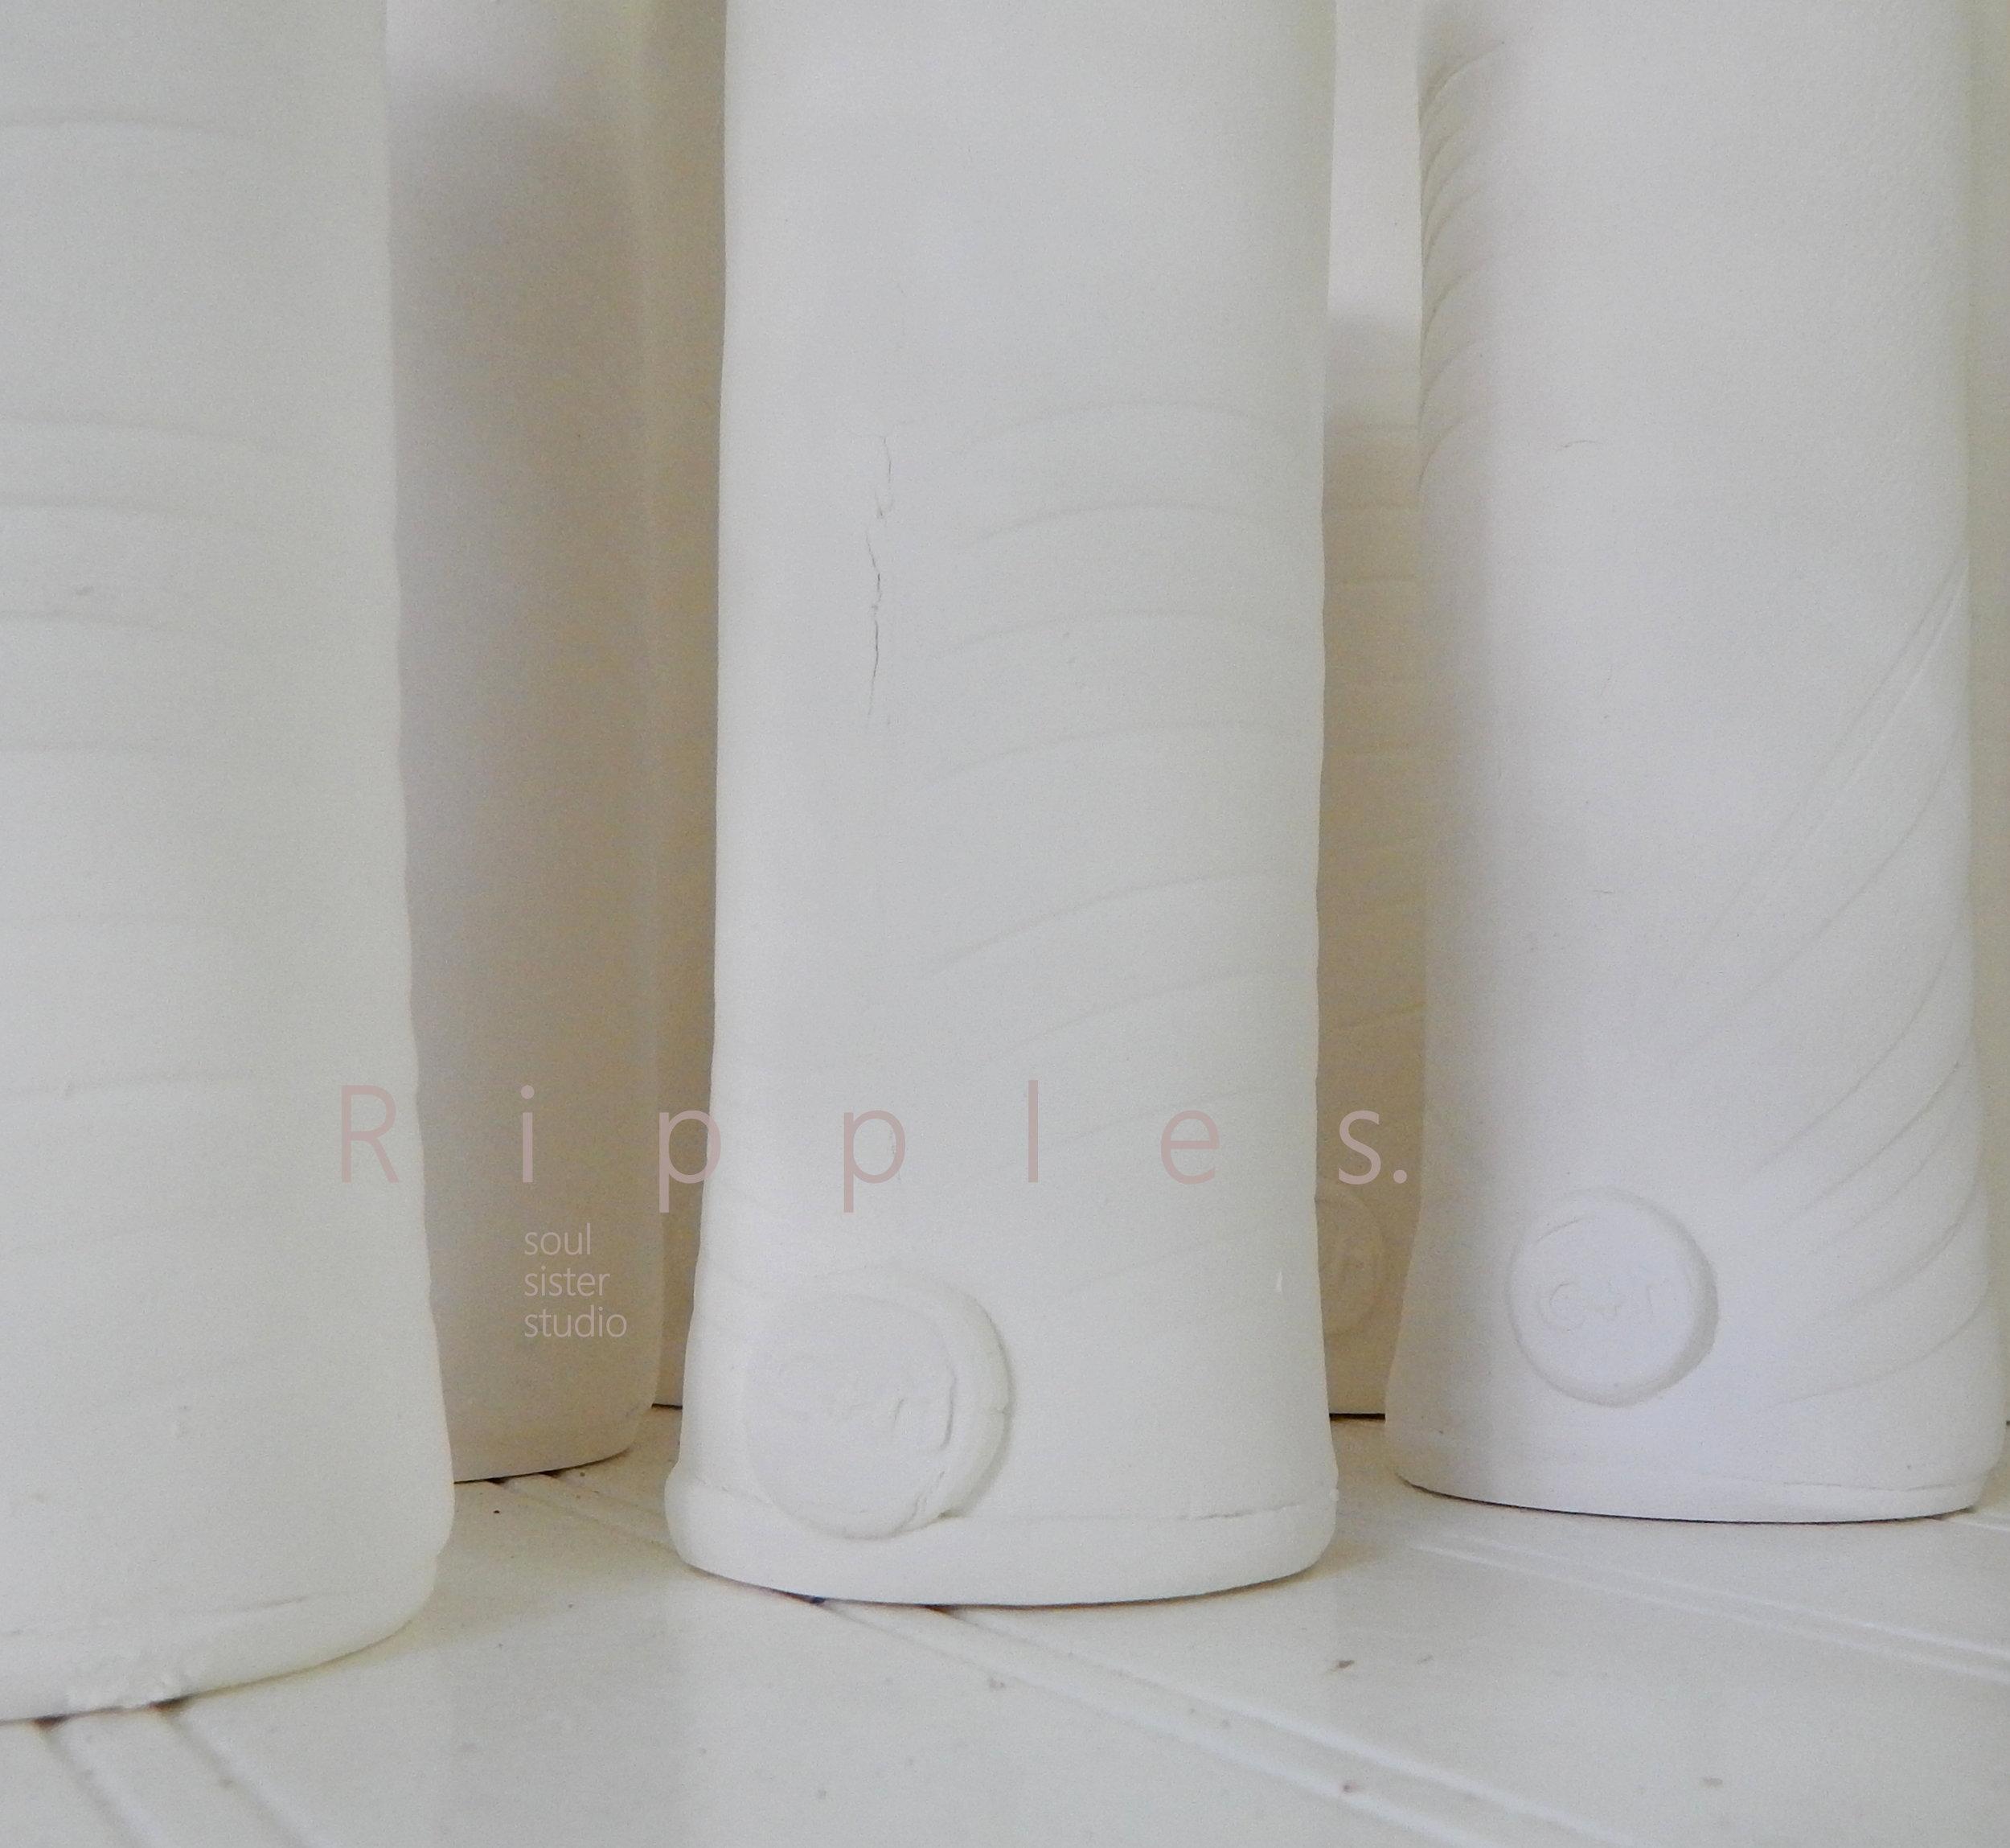 PotteryWhiteRipples.jpg